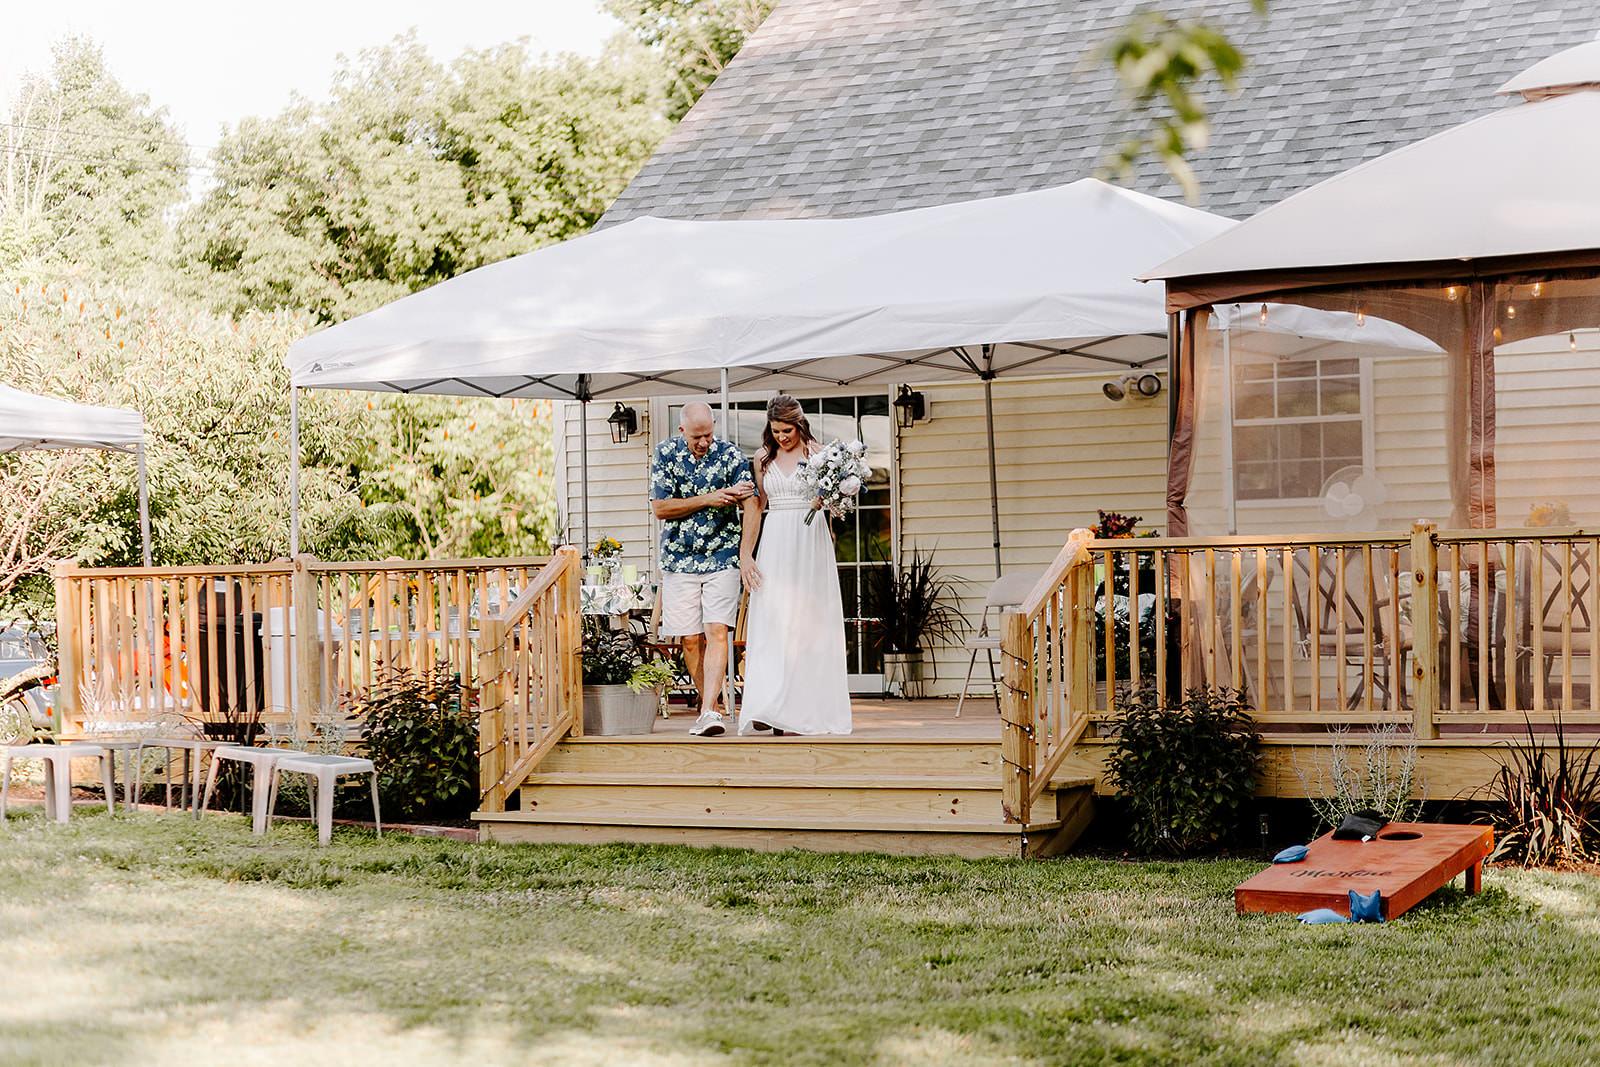 hudson valley wedding photographer, new york wedding photographer, catskills wedding photographer covid backyard micro wedding